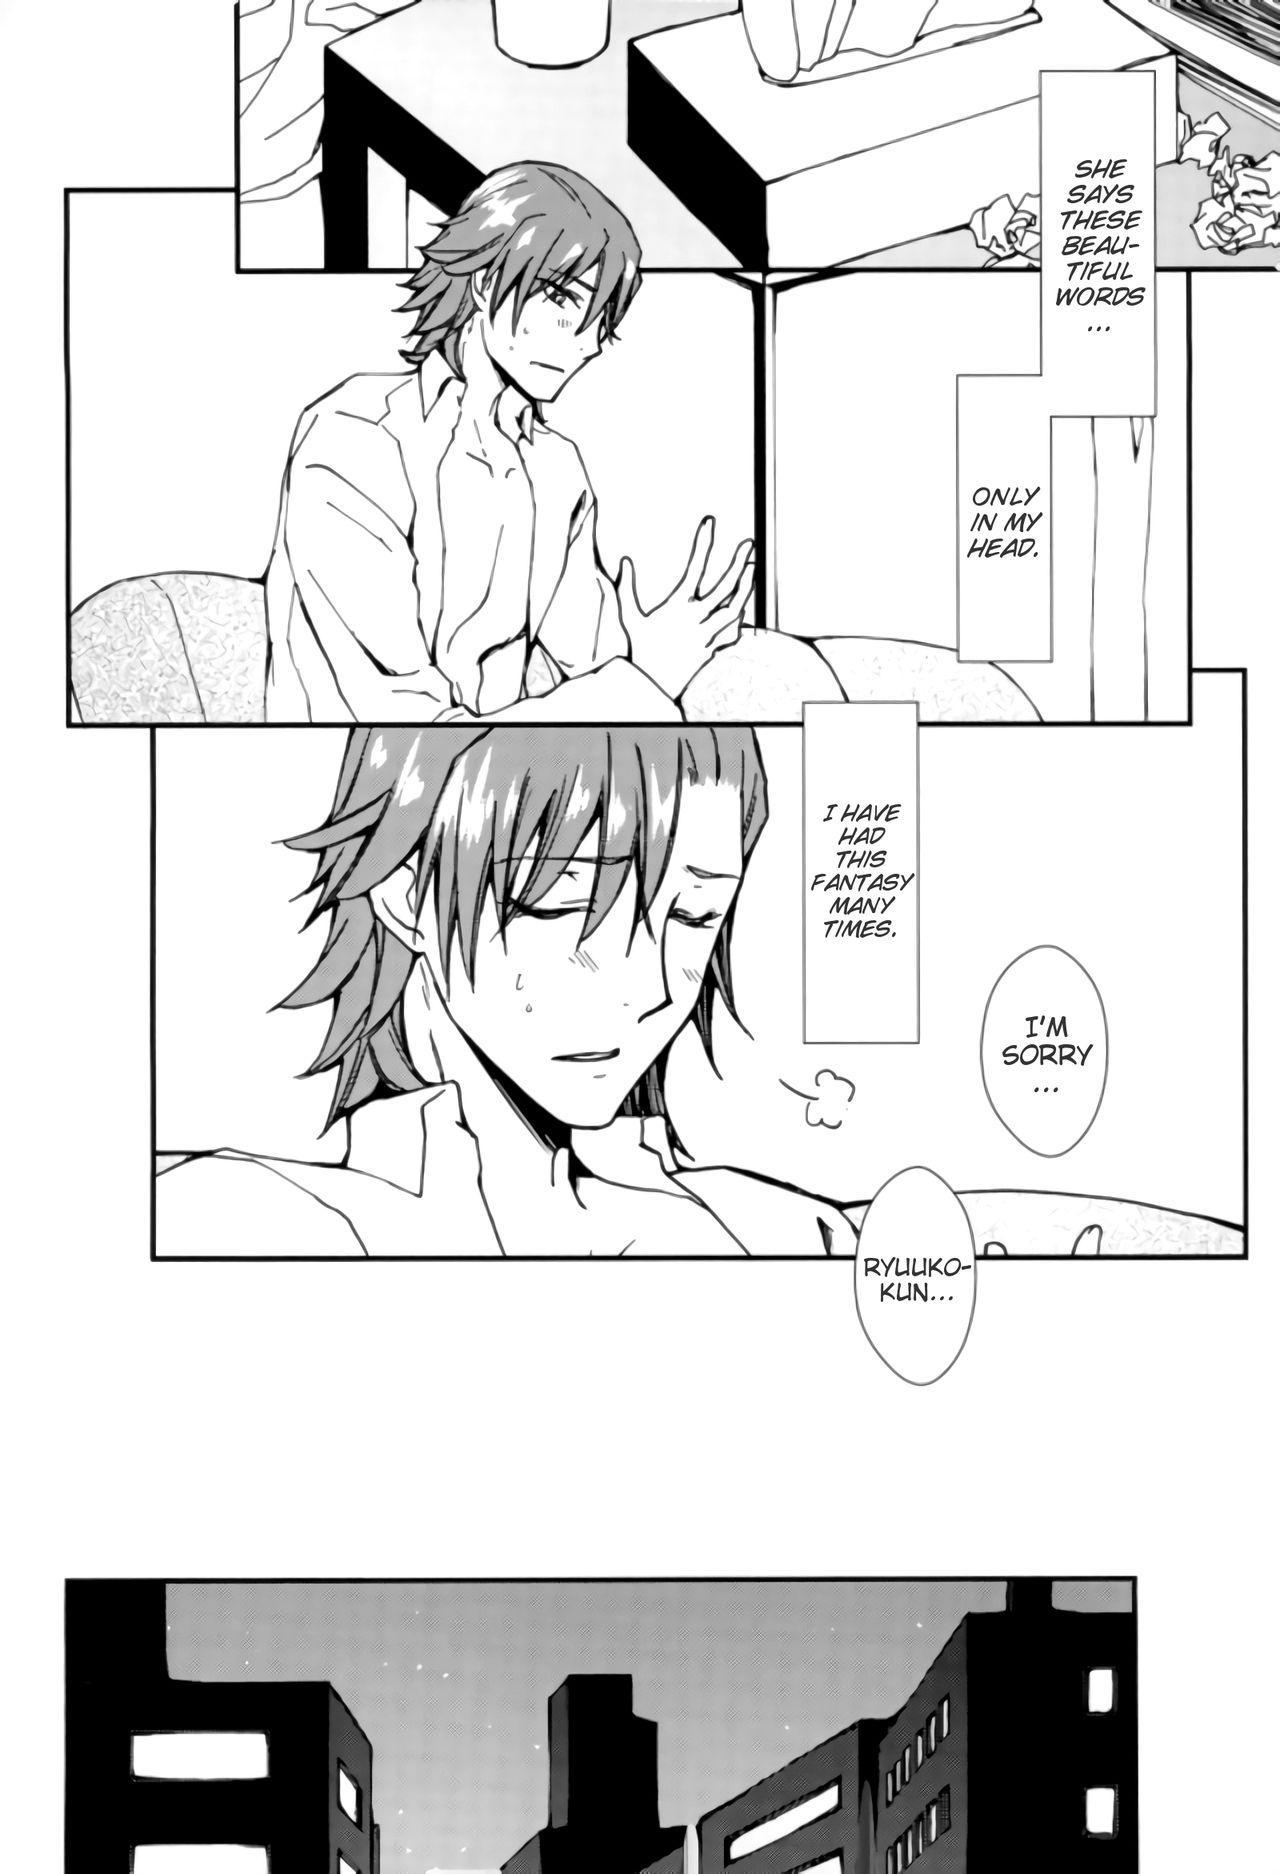 Sekai de Ichiban Kimi ga Suki | You mean the world to me, I'll make love to you tonight. 20